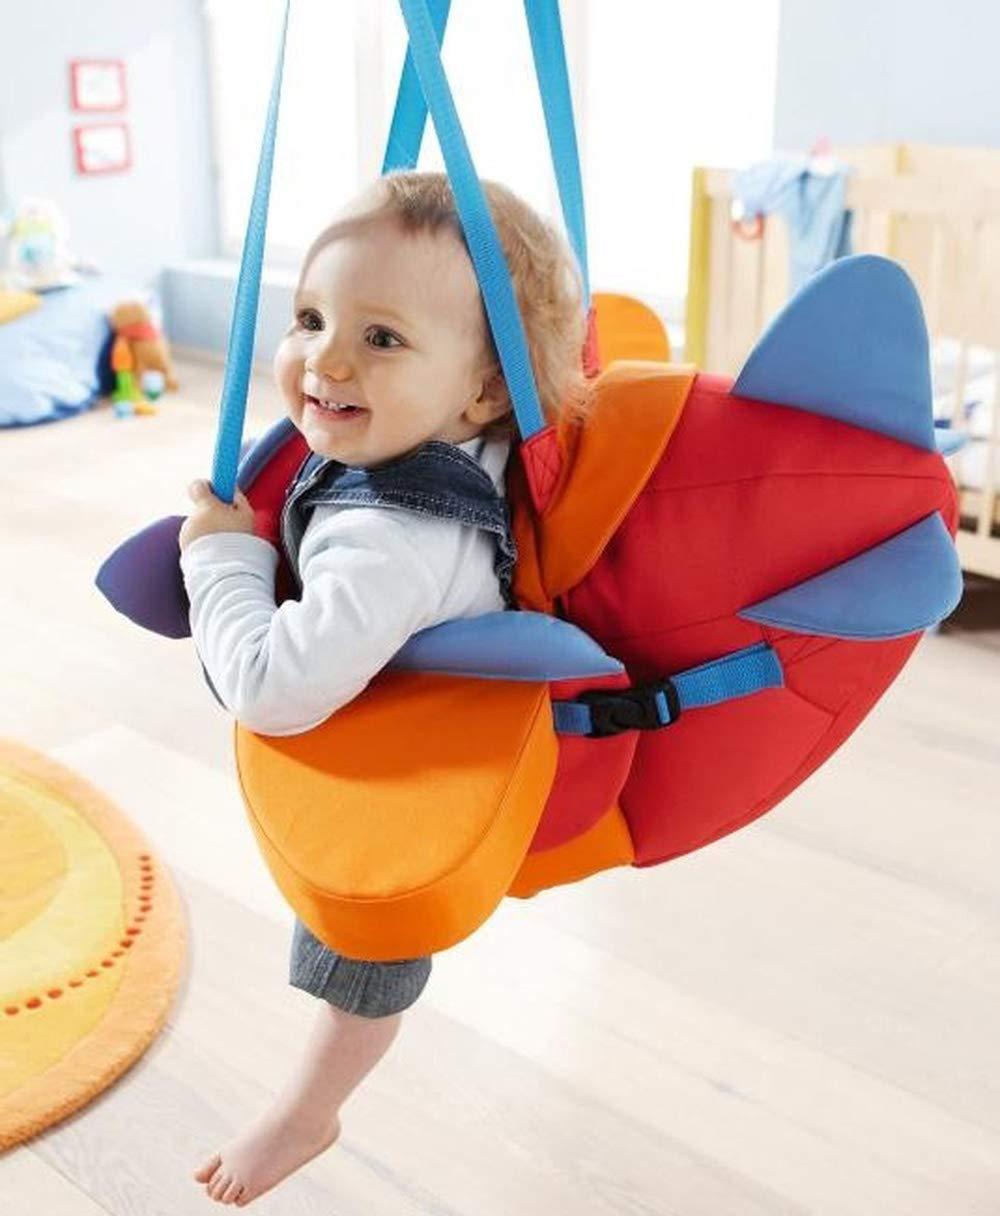 HABA-Horse-Baby-Indoor-Swing -Adjustable-Height-soft-material